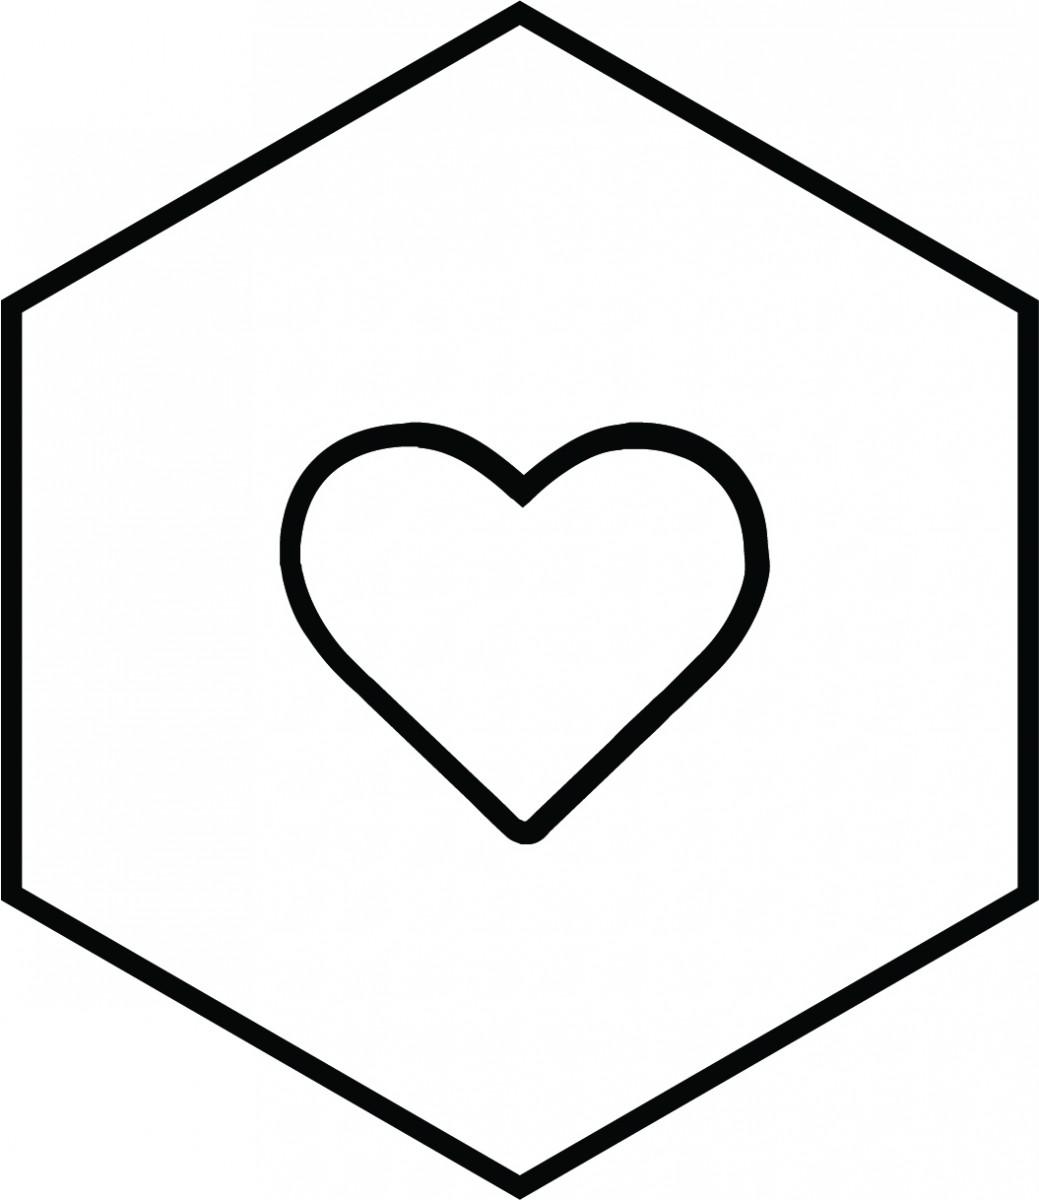 Informatics icon with heart